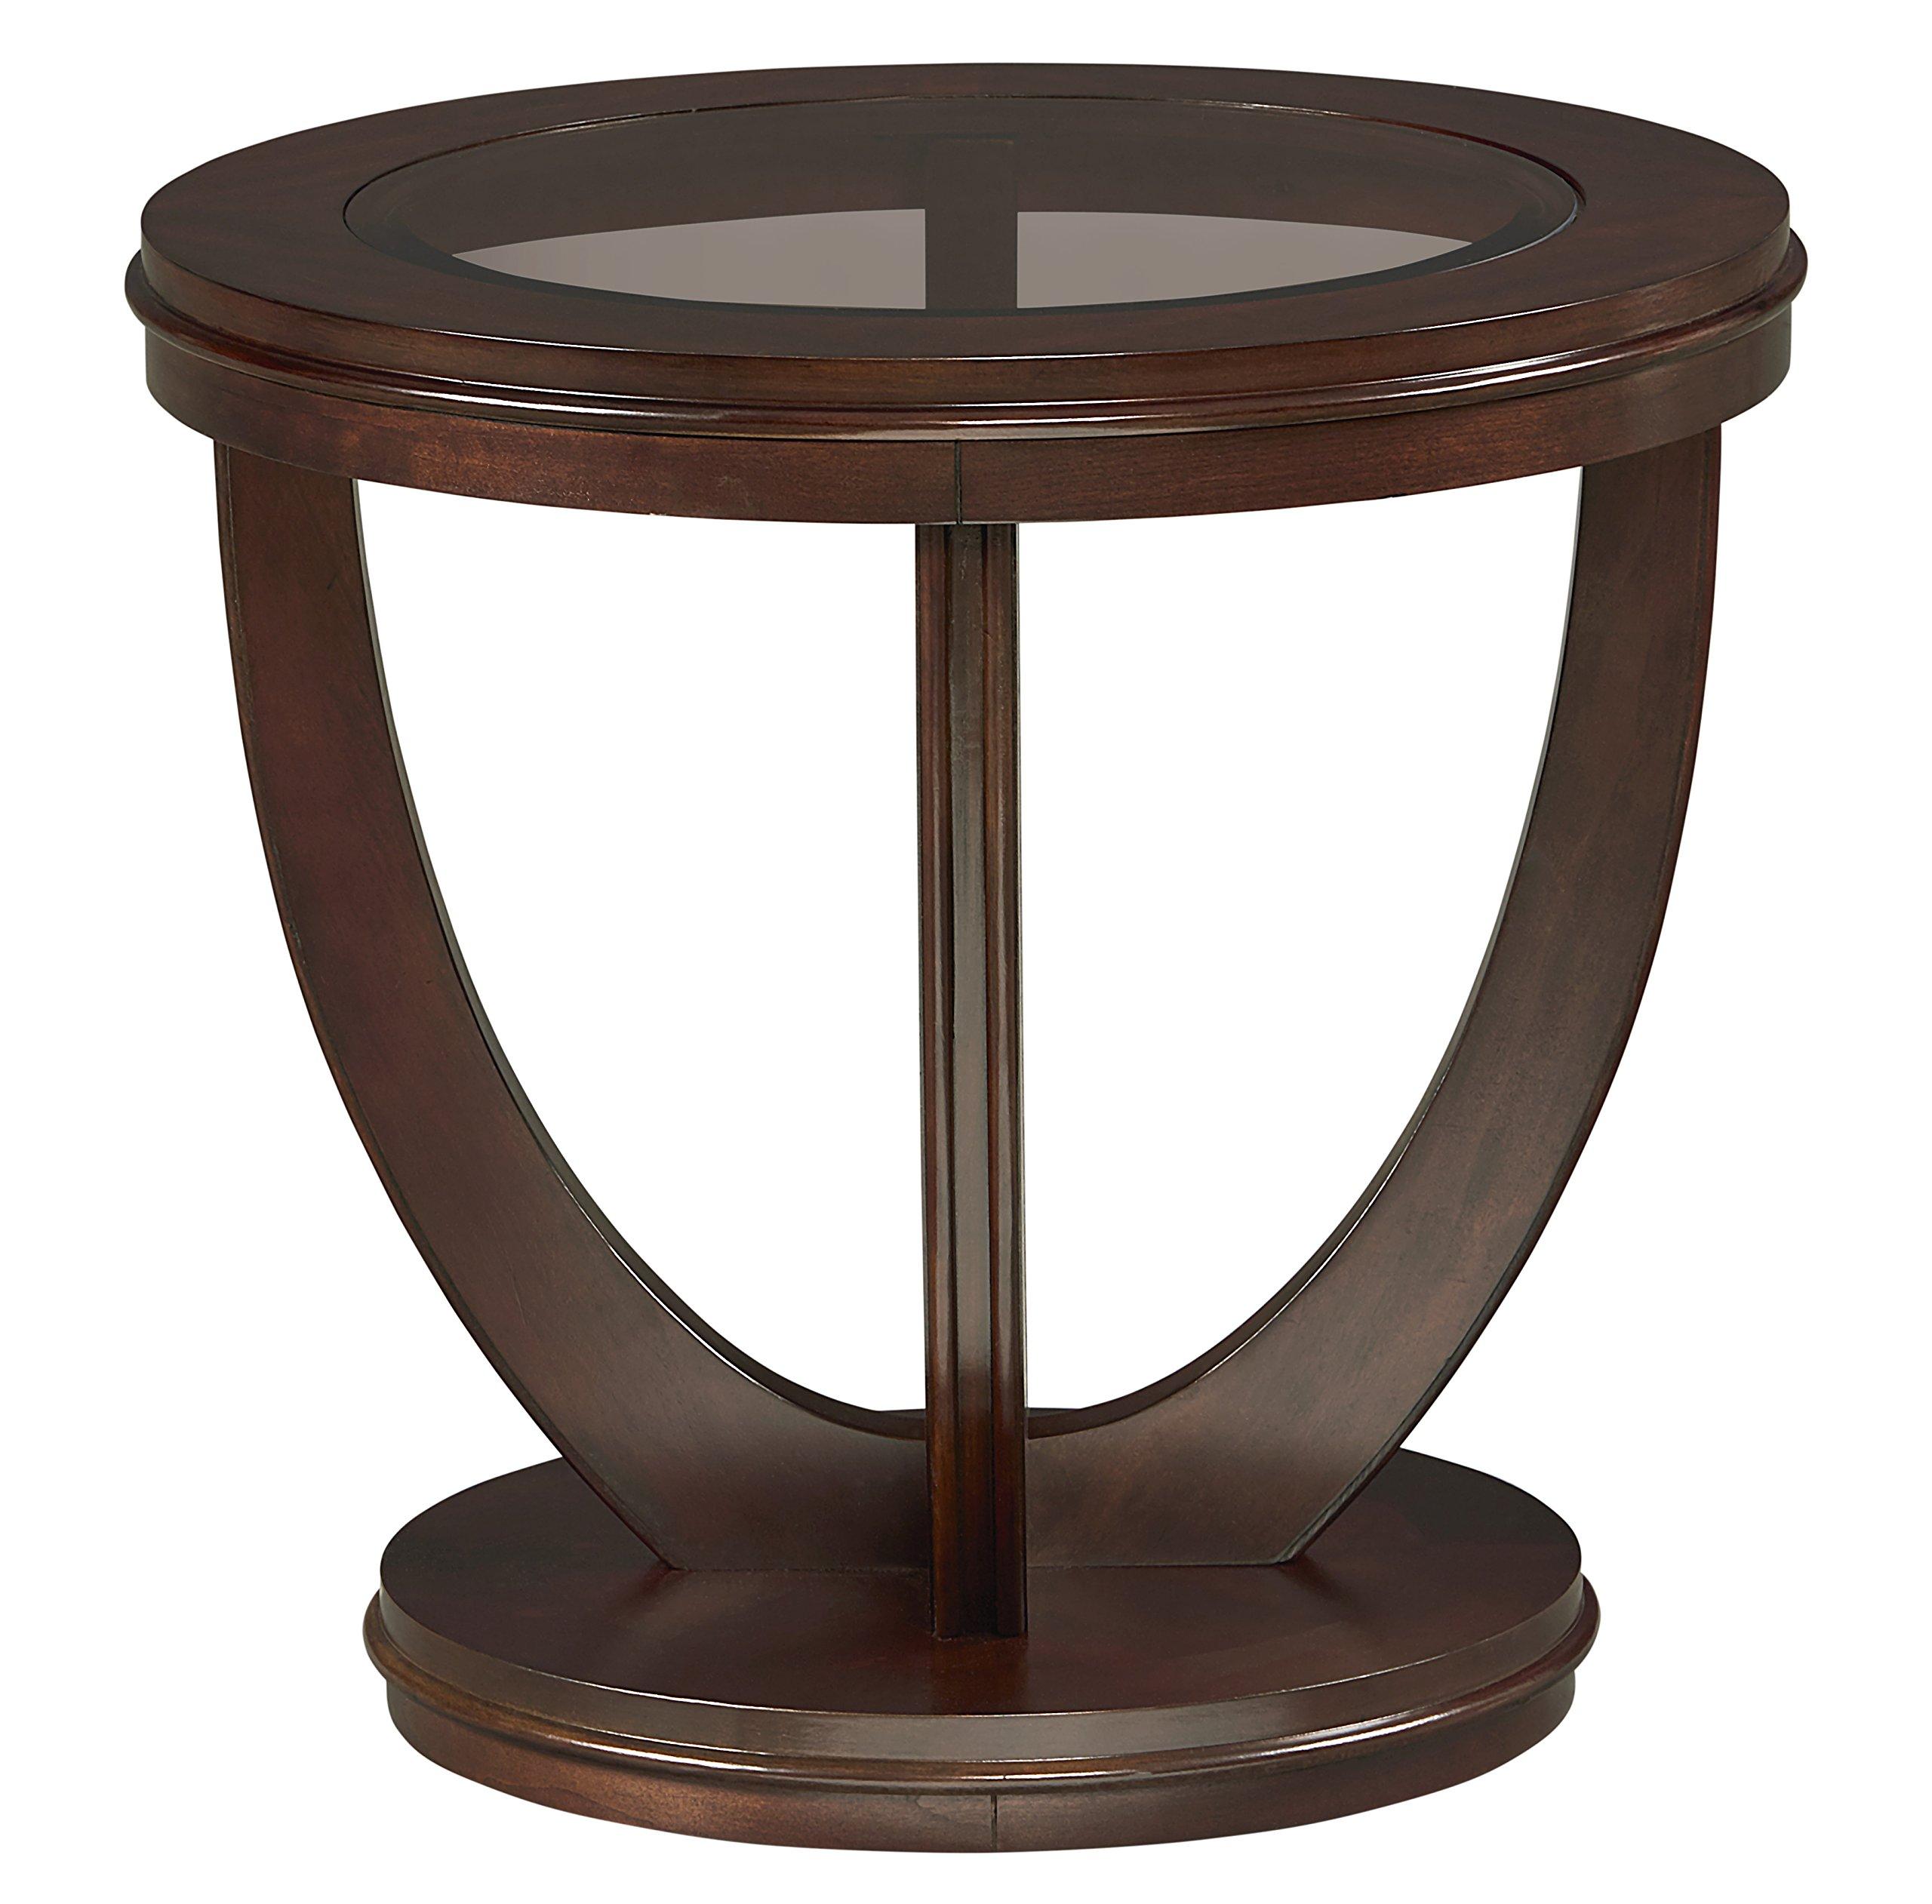 Standard Furniture 23762 La Jolla End Table, Brown by Standard Furniture